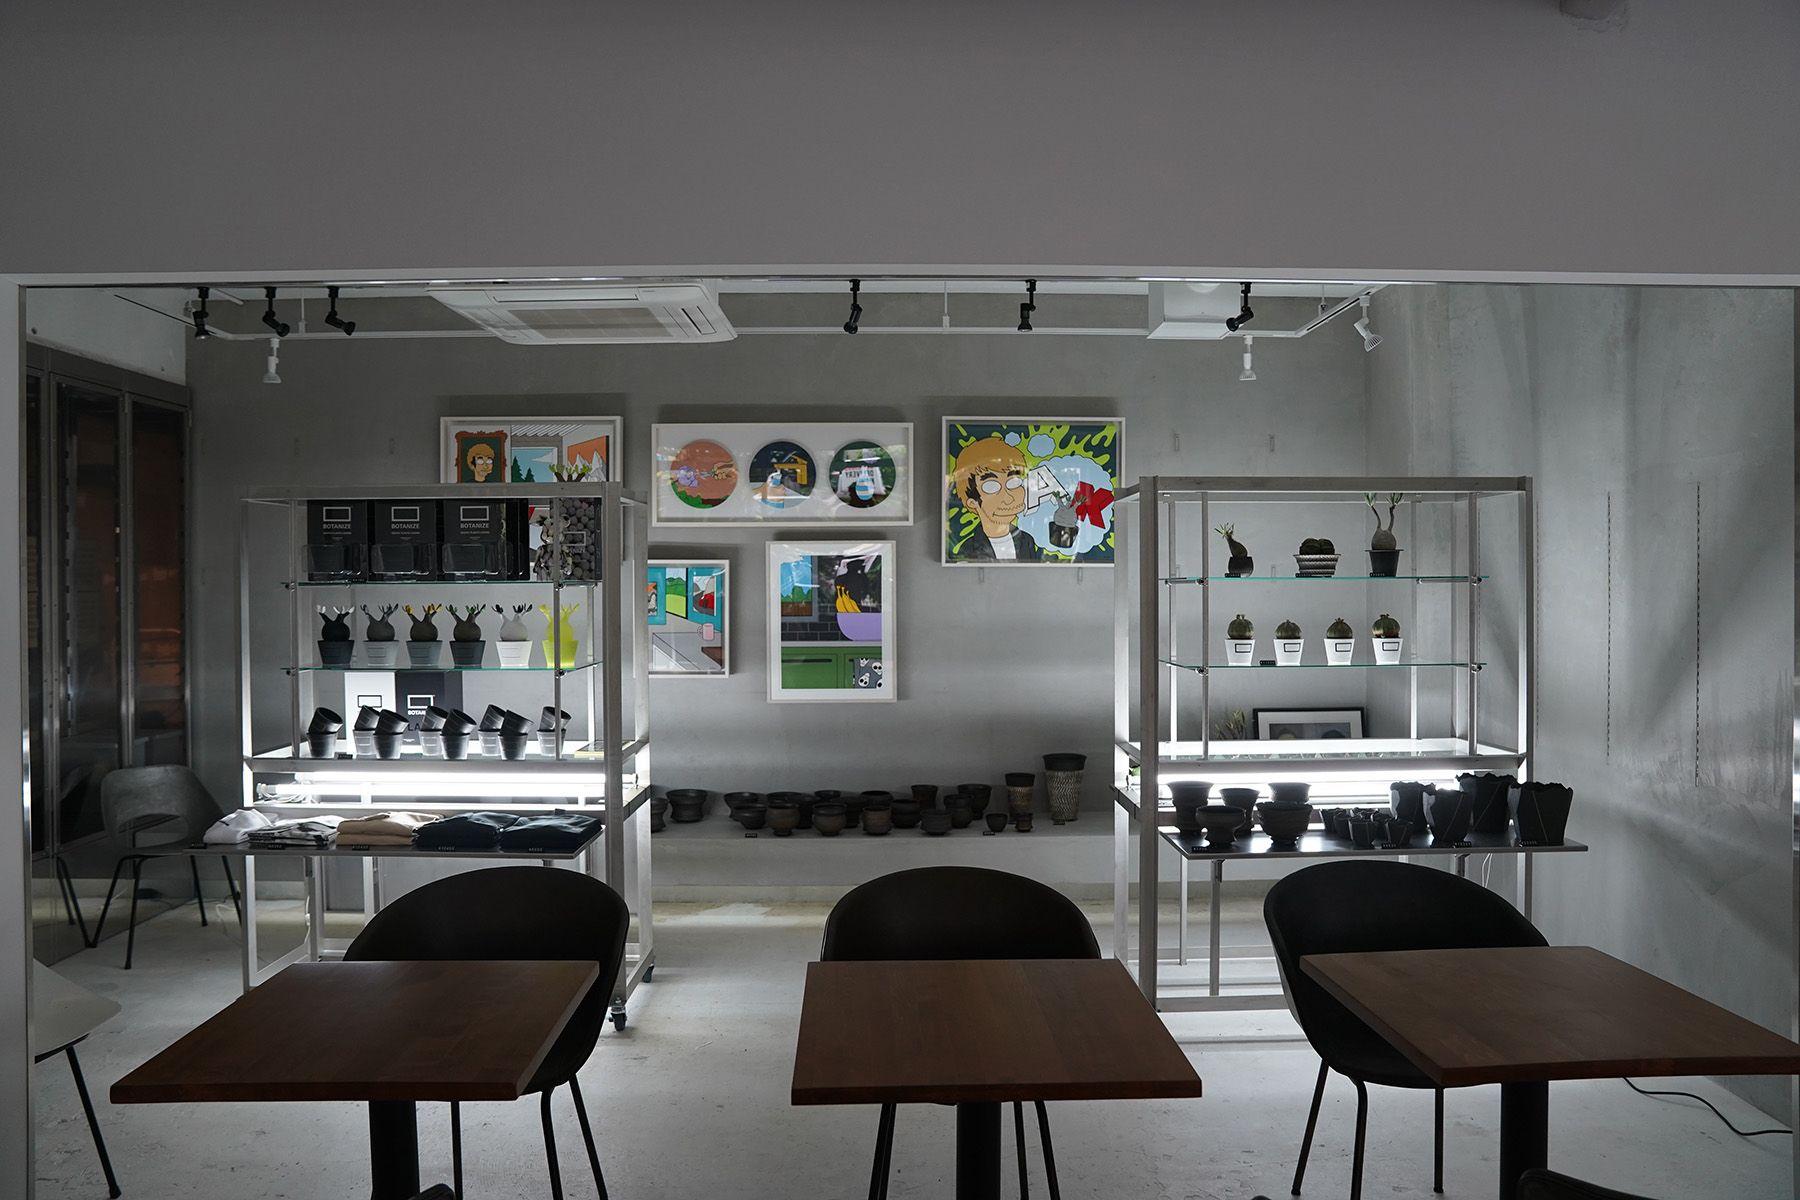 ANEA CAFÉ  松見坂/店舗 (アネアカフェ マツミザカ)アート+植物